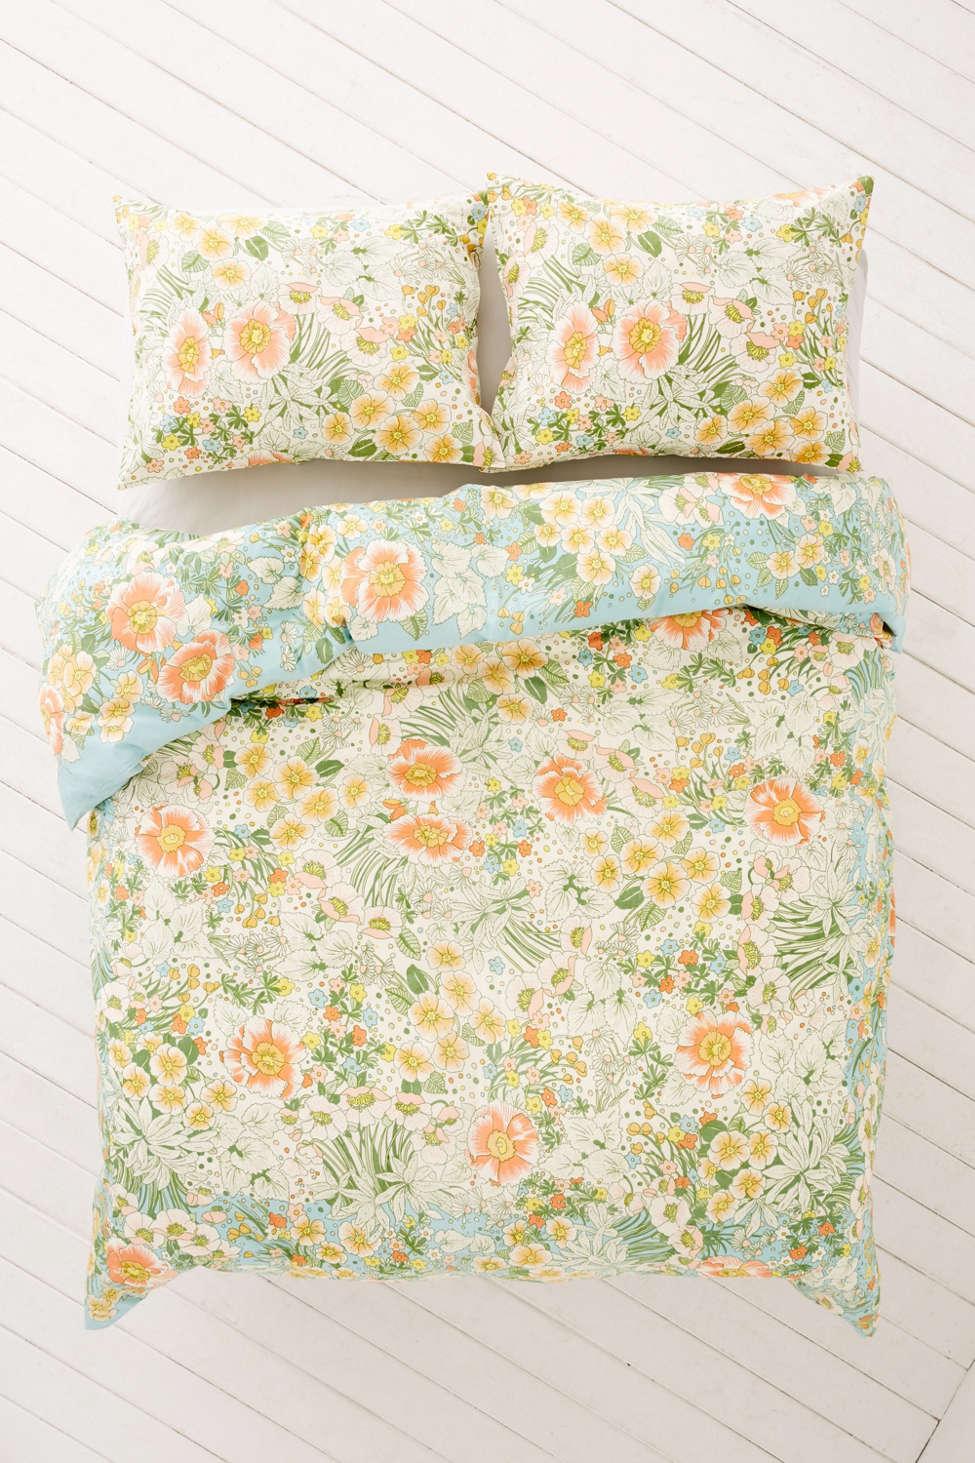 Slide View: 2: Lovise Floral Scarf Duvet Cover